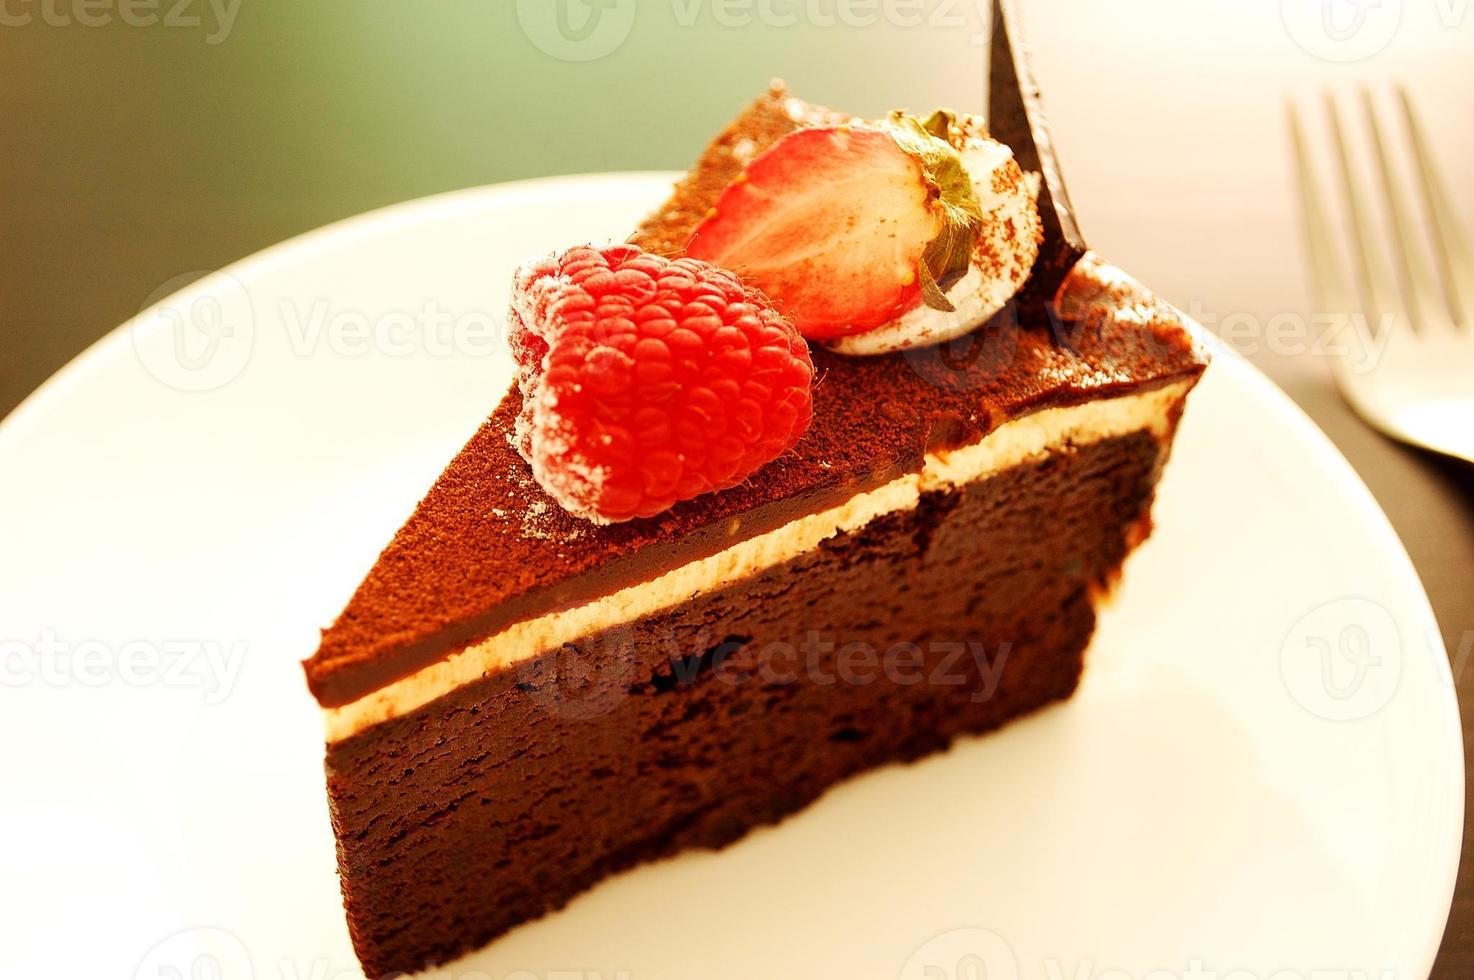 weicher Schokoladenfondant-Souffle foto